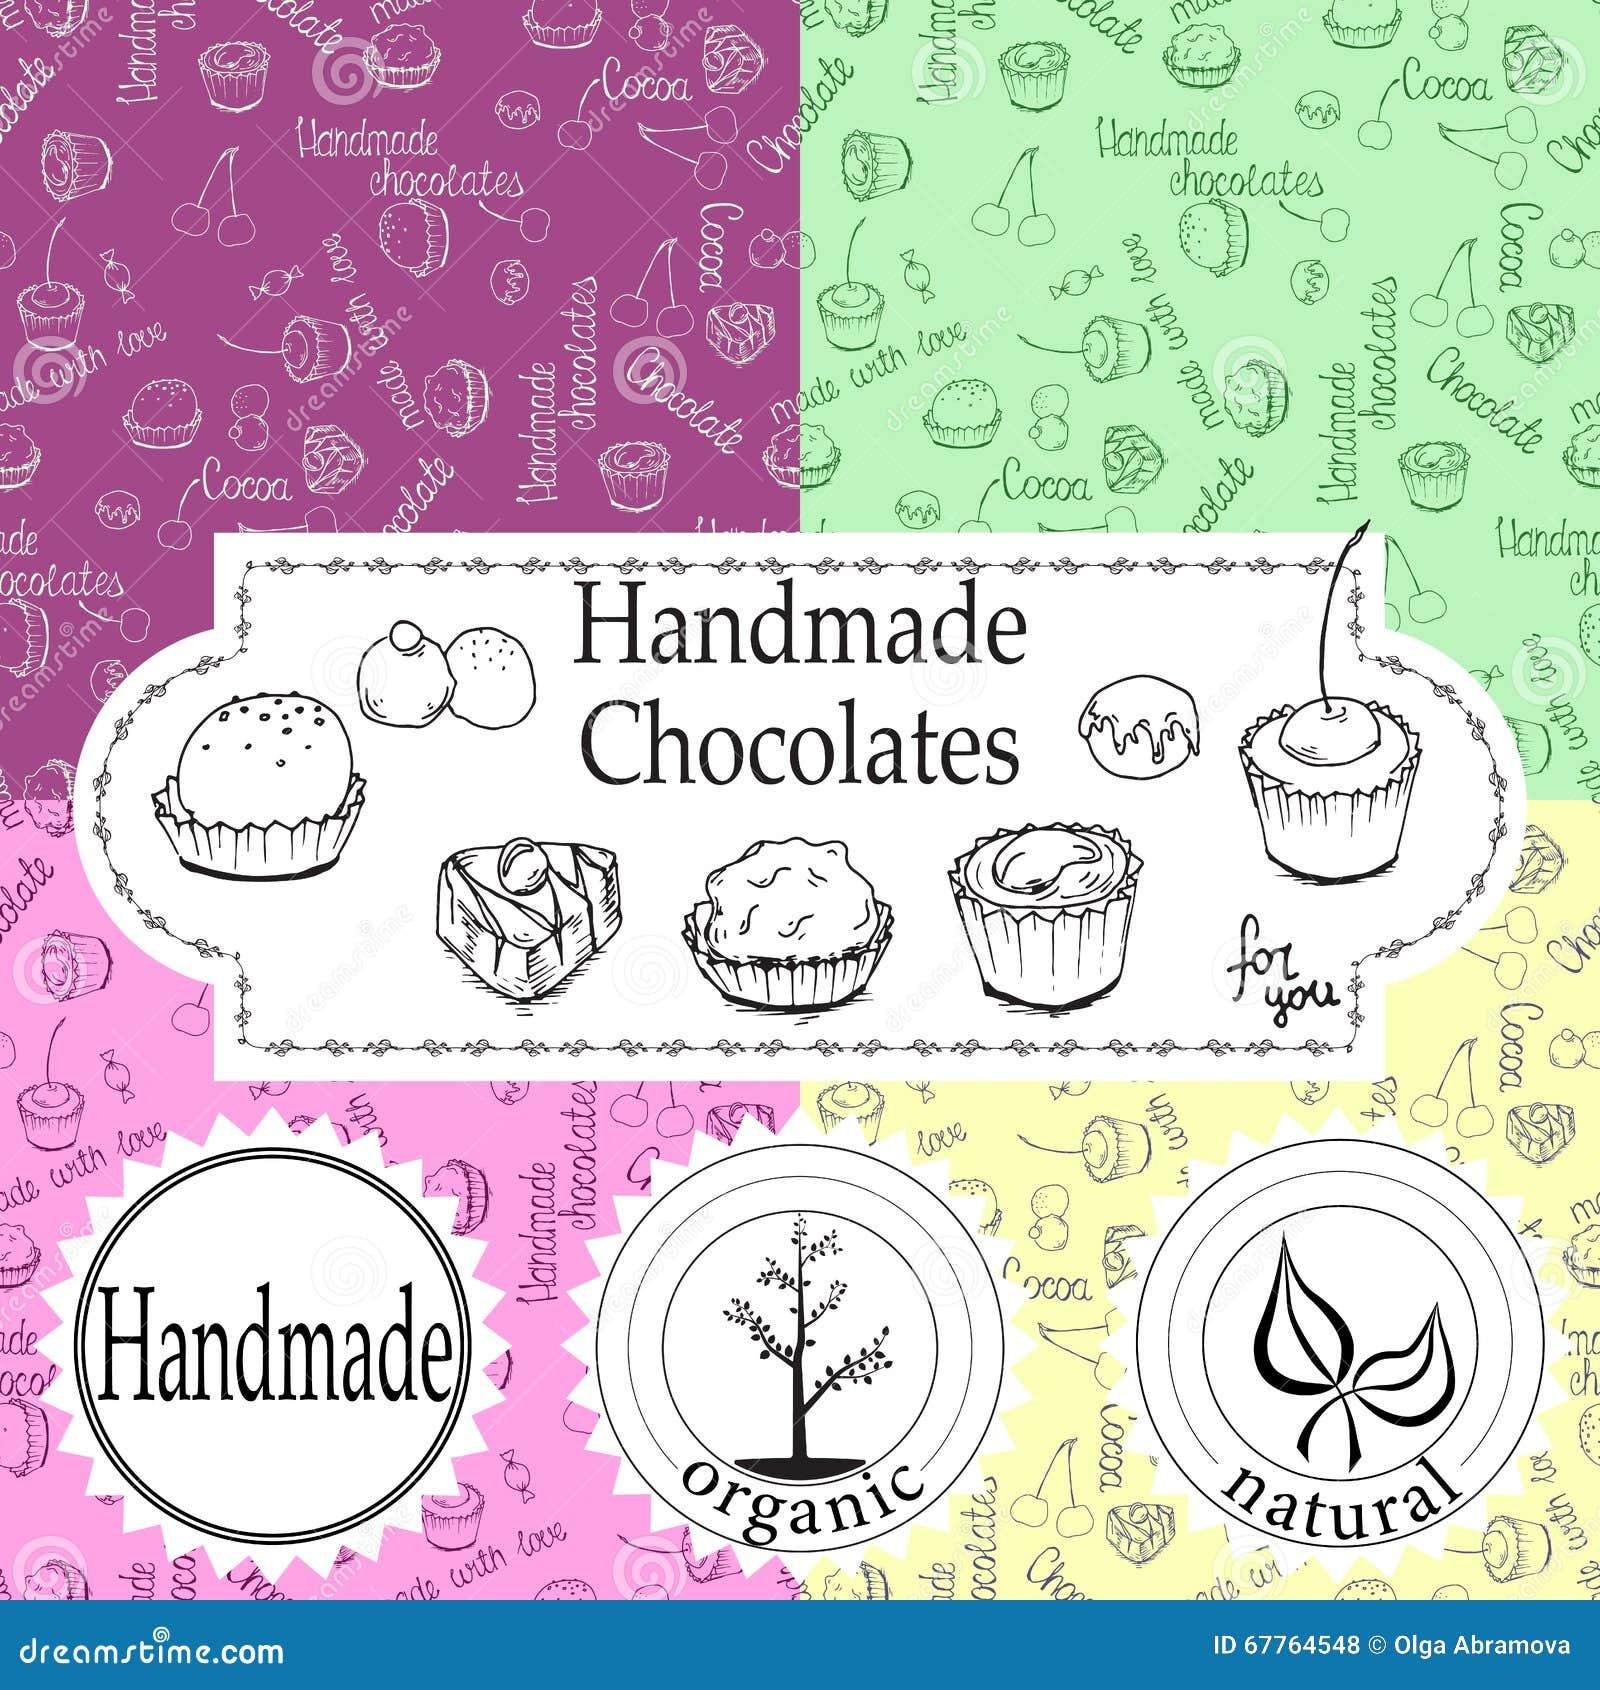 Vector handmade chocolates packaging templates and design elements vector handmade chocolates packaging templates and design elements for candy shop cardboard with emblems and maxwellsz